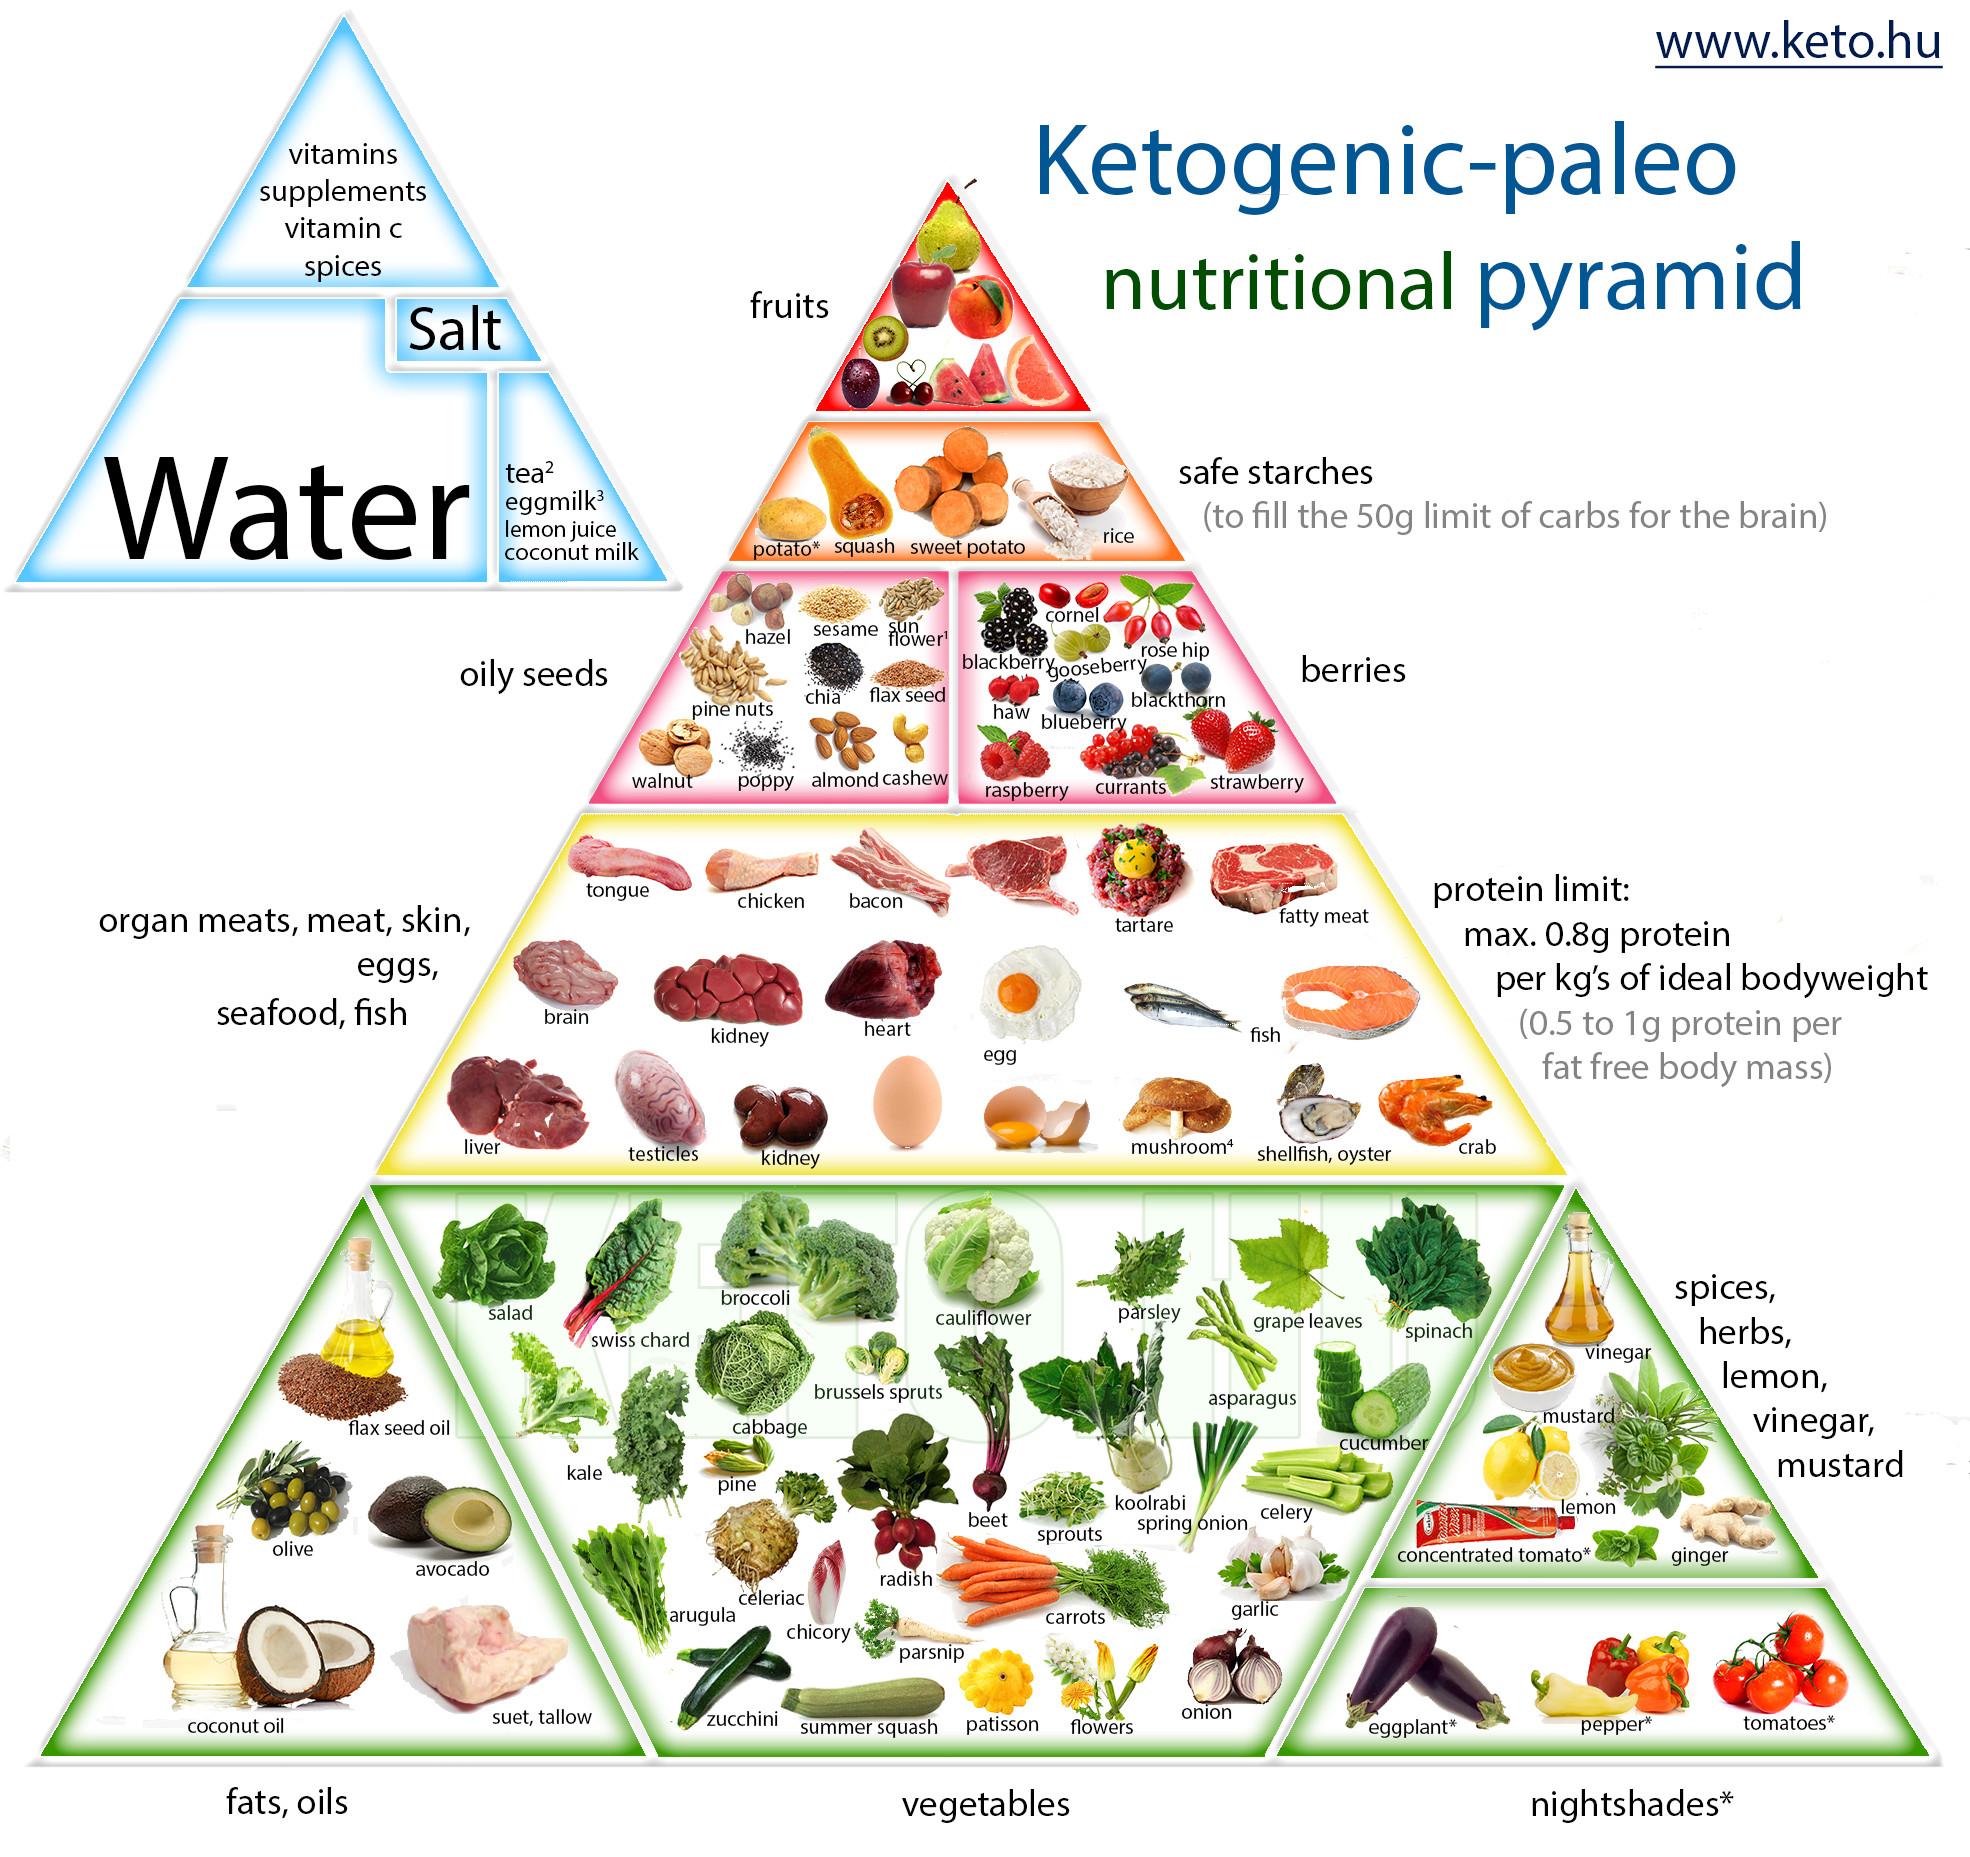 Keto Paleo Diet  ketogenic paleo nutrition pyramid